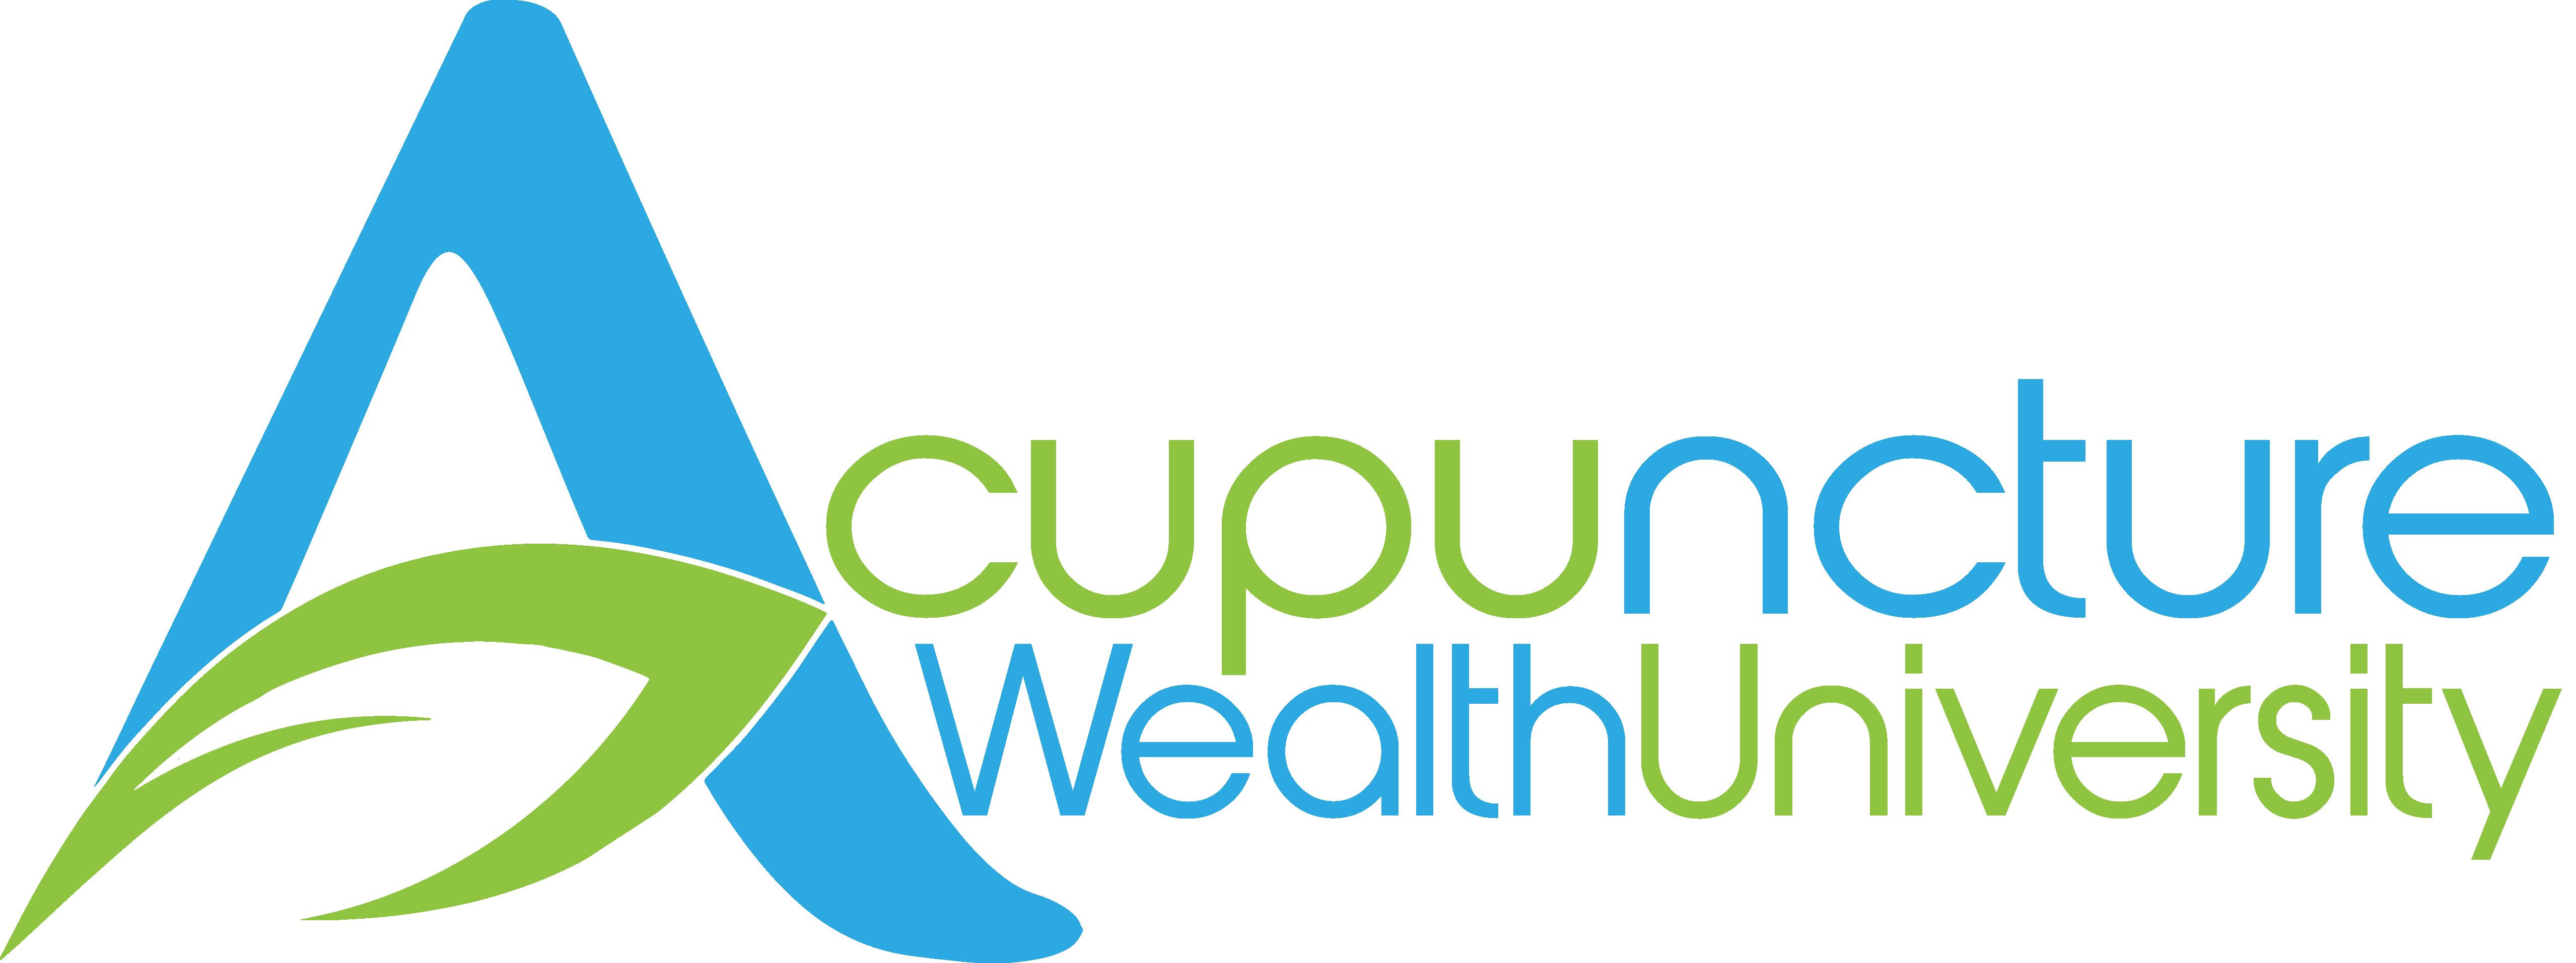 Acupuncture Wealth University